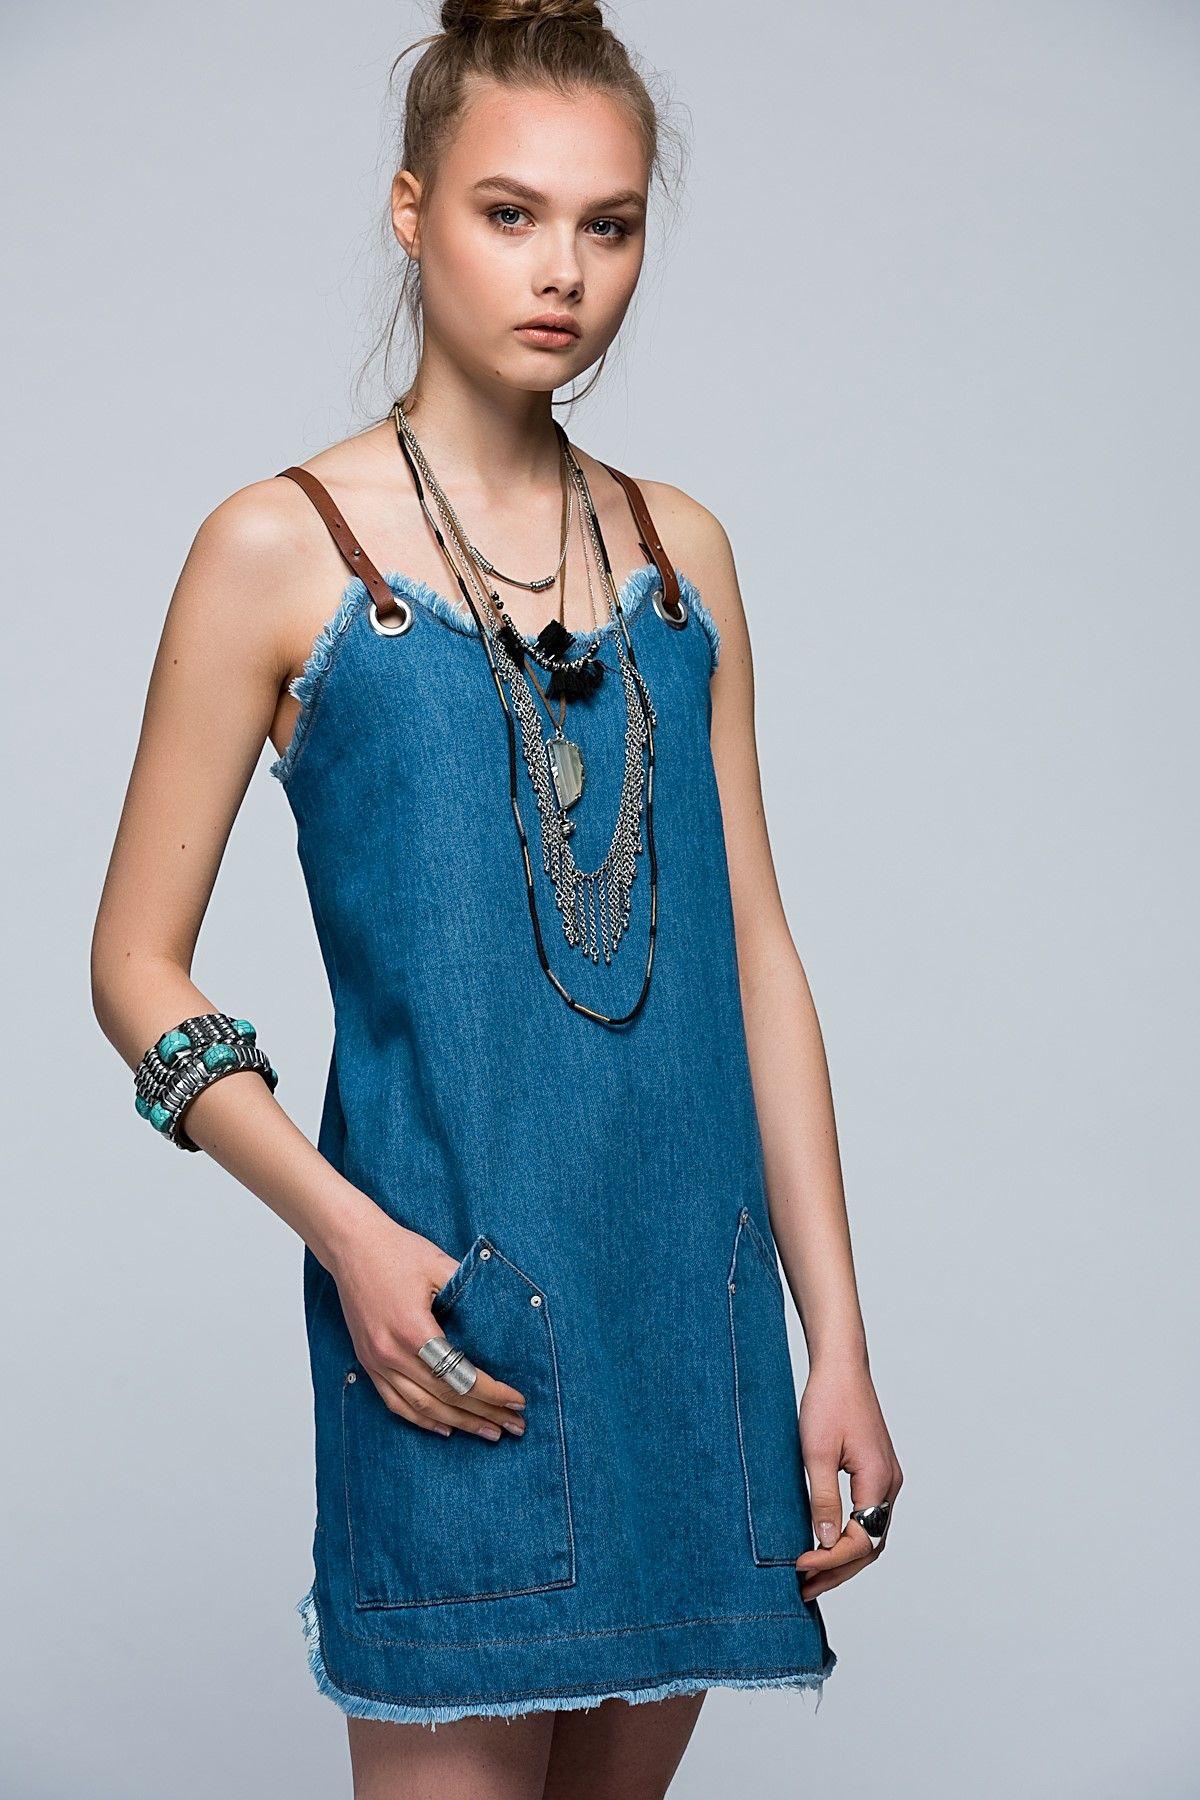 Mavi Deri Askili Denim Elbise 101a09585 Moda Stilleri Elbise Kot Elbiseler